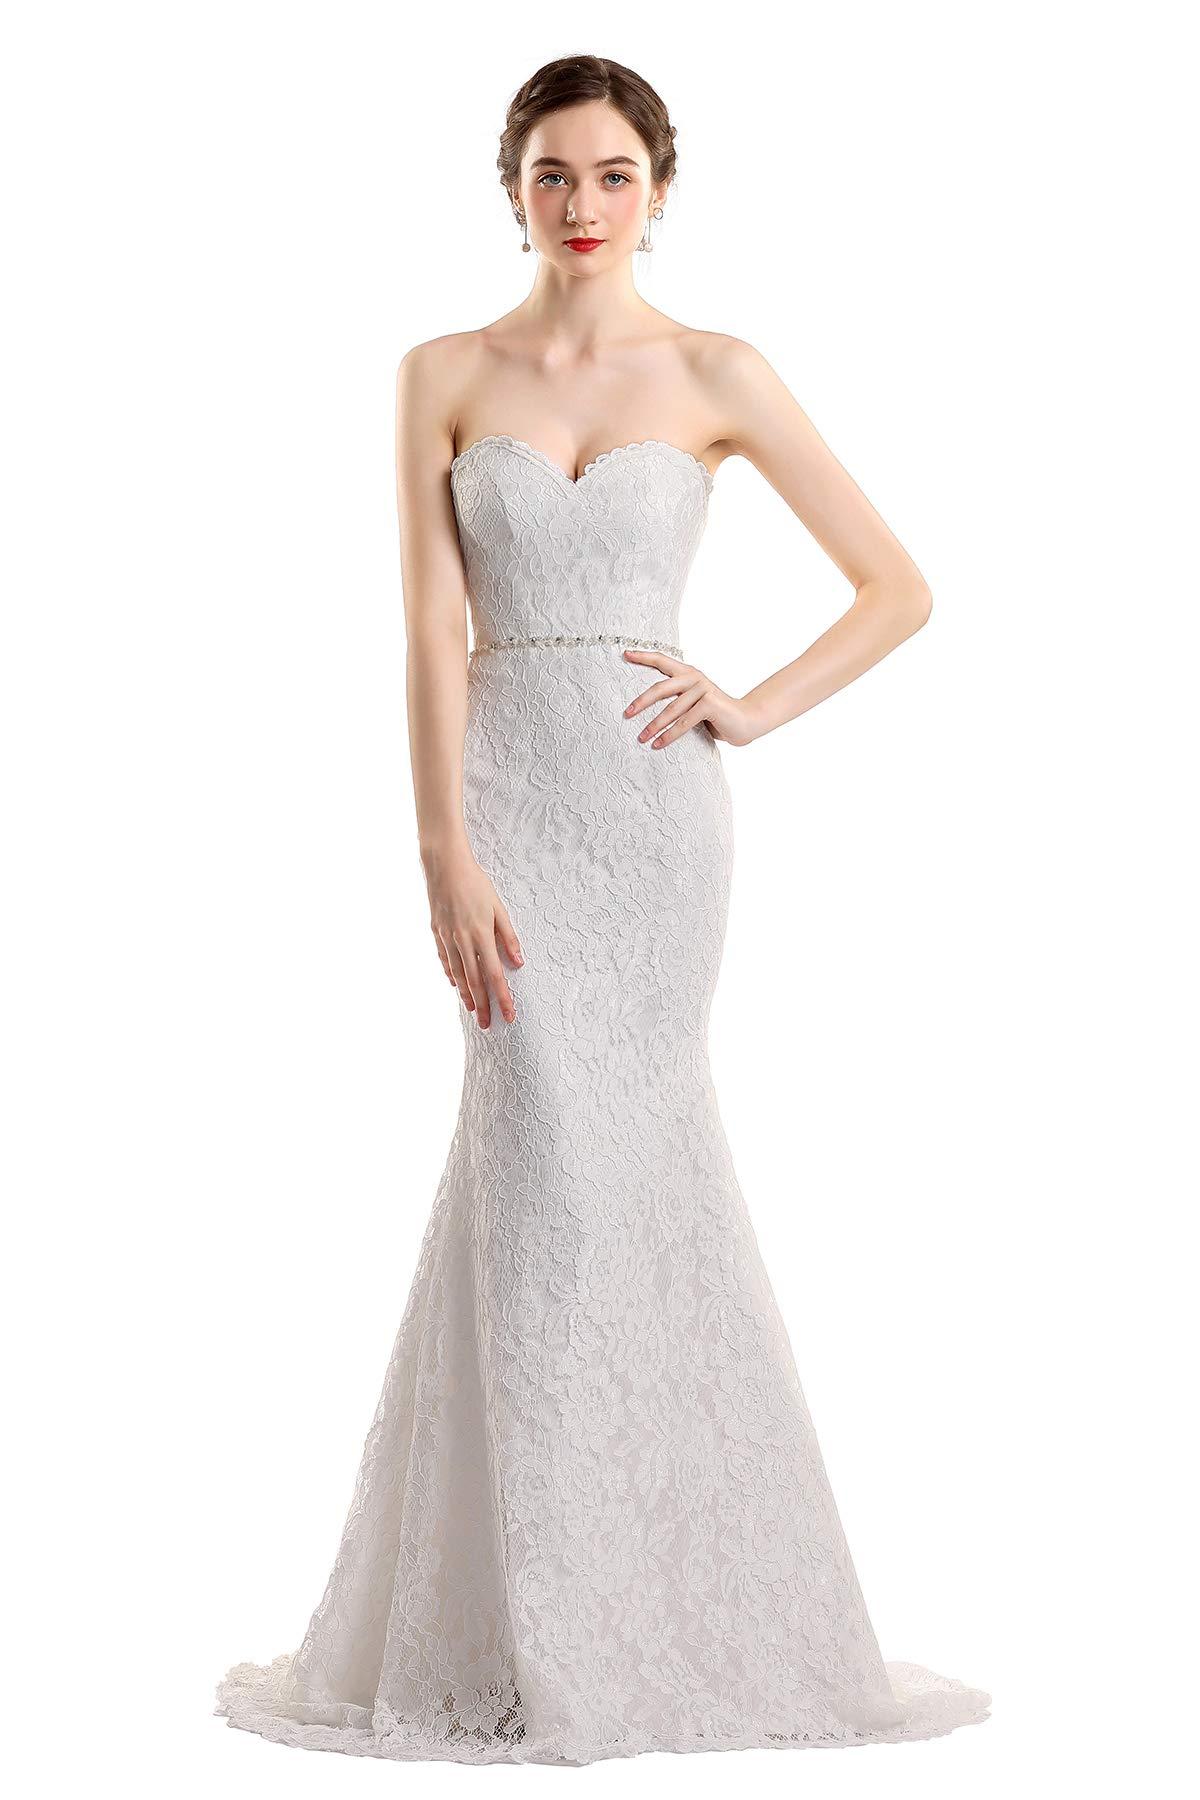 e246f8236d4 ... Lace Beach Wedding Dress Cap Sleeve Bridal Gowns White 12. ; 